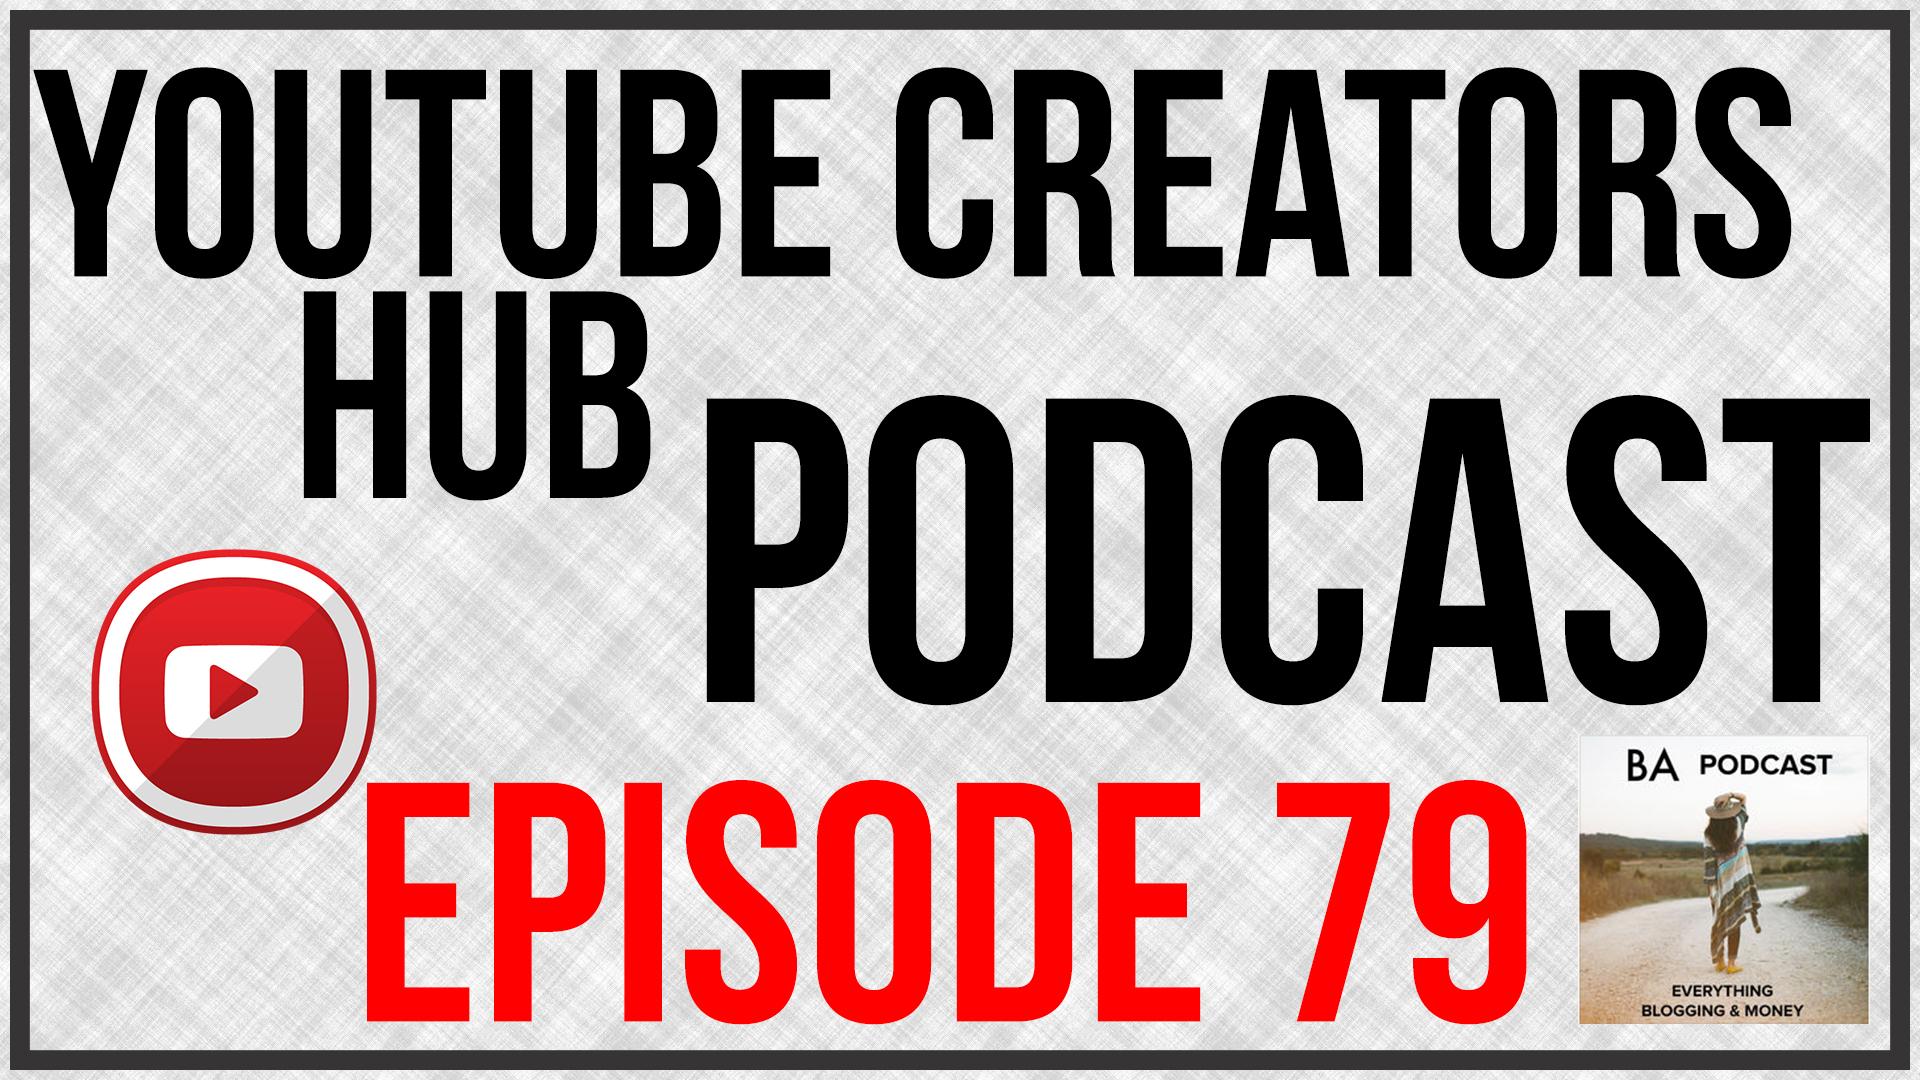 YouTube Creators Hub Podcast Episode 79